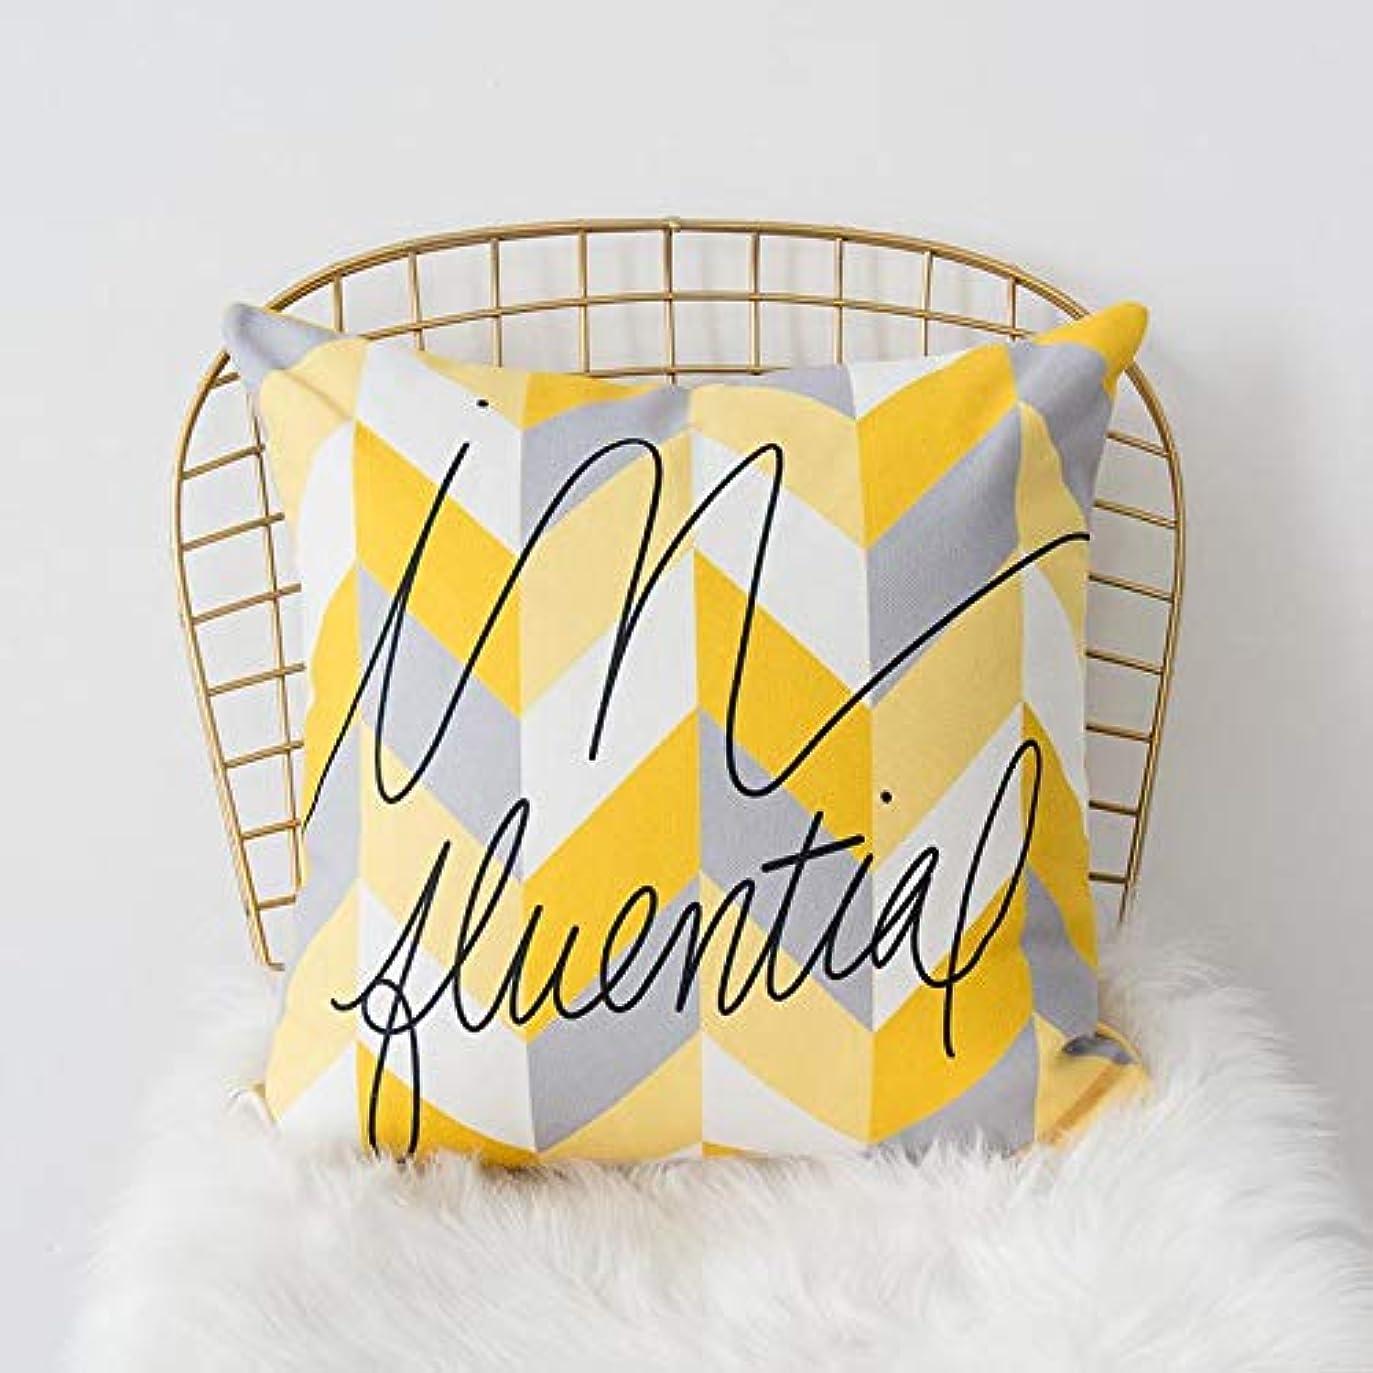 SMART 黄色グレー枕北欧スタイル黄色ヘラジカ幾何枕リビングルームのインテリアソファクッション Cojines 装飾良質 クッション 椅子